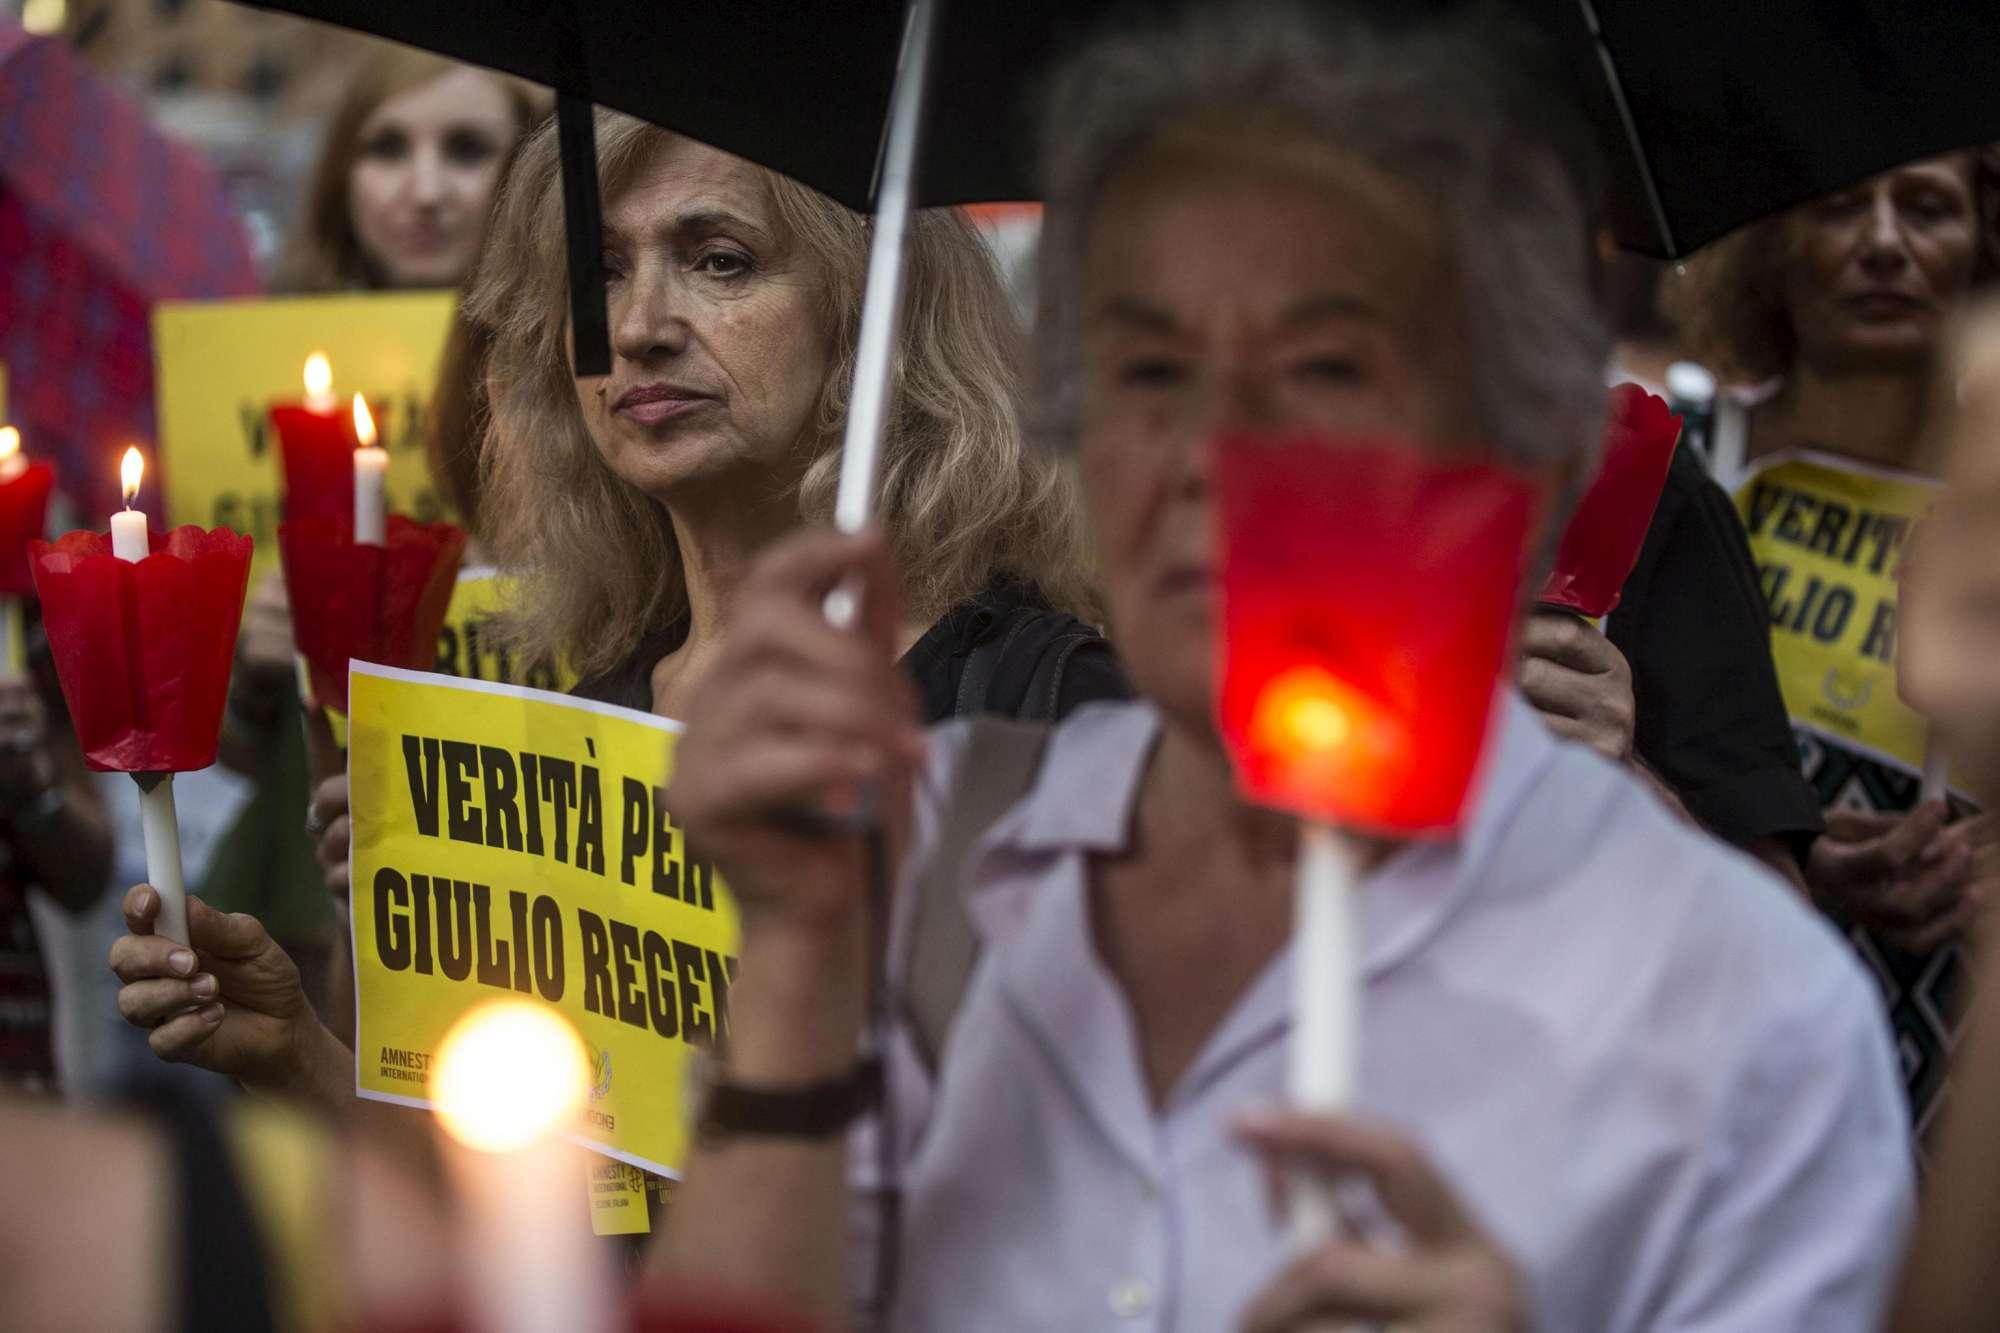 Fiaccolate a Ragusa  e Siracusa di Amnesty a 4 anni dalla scomparsa di Giulio Regeni